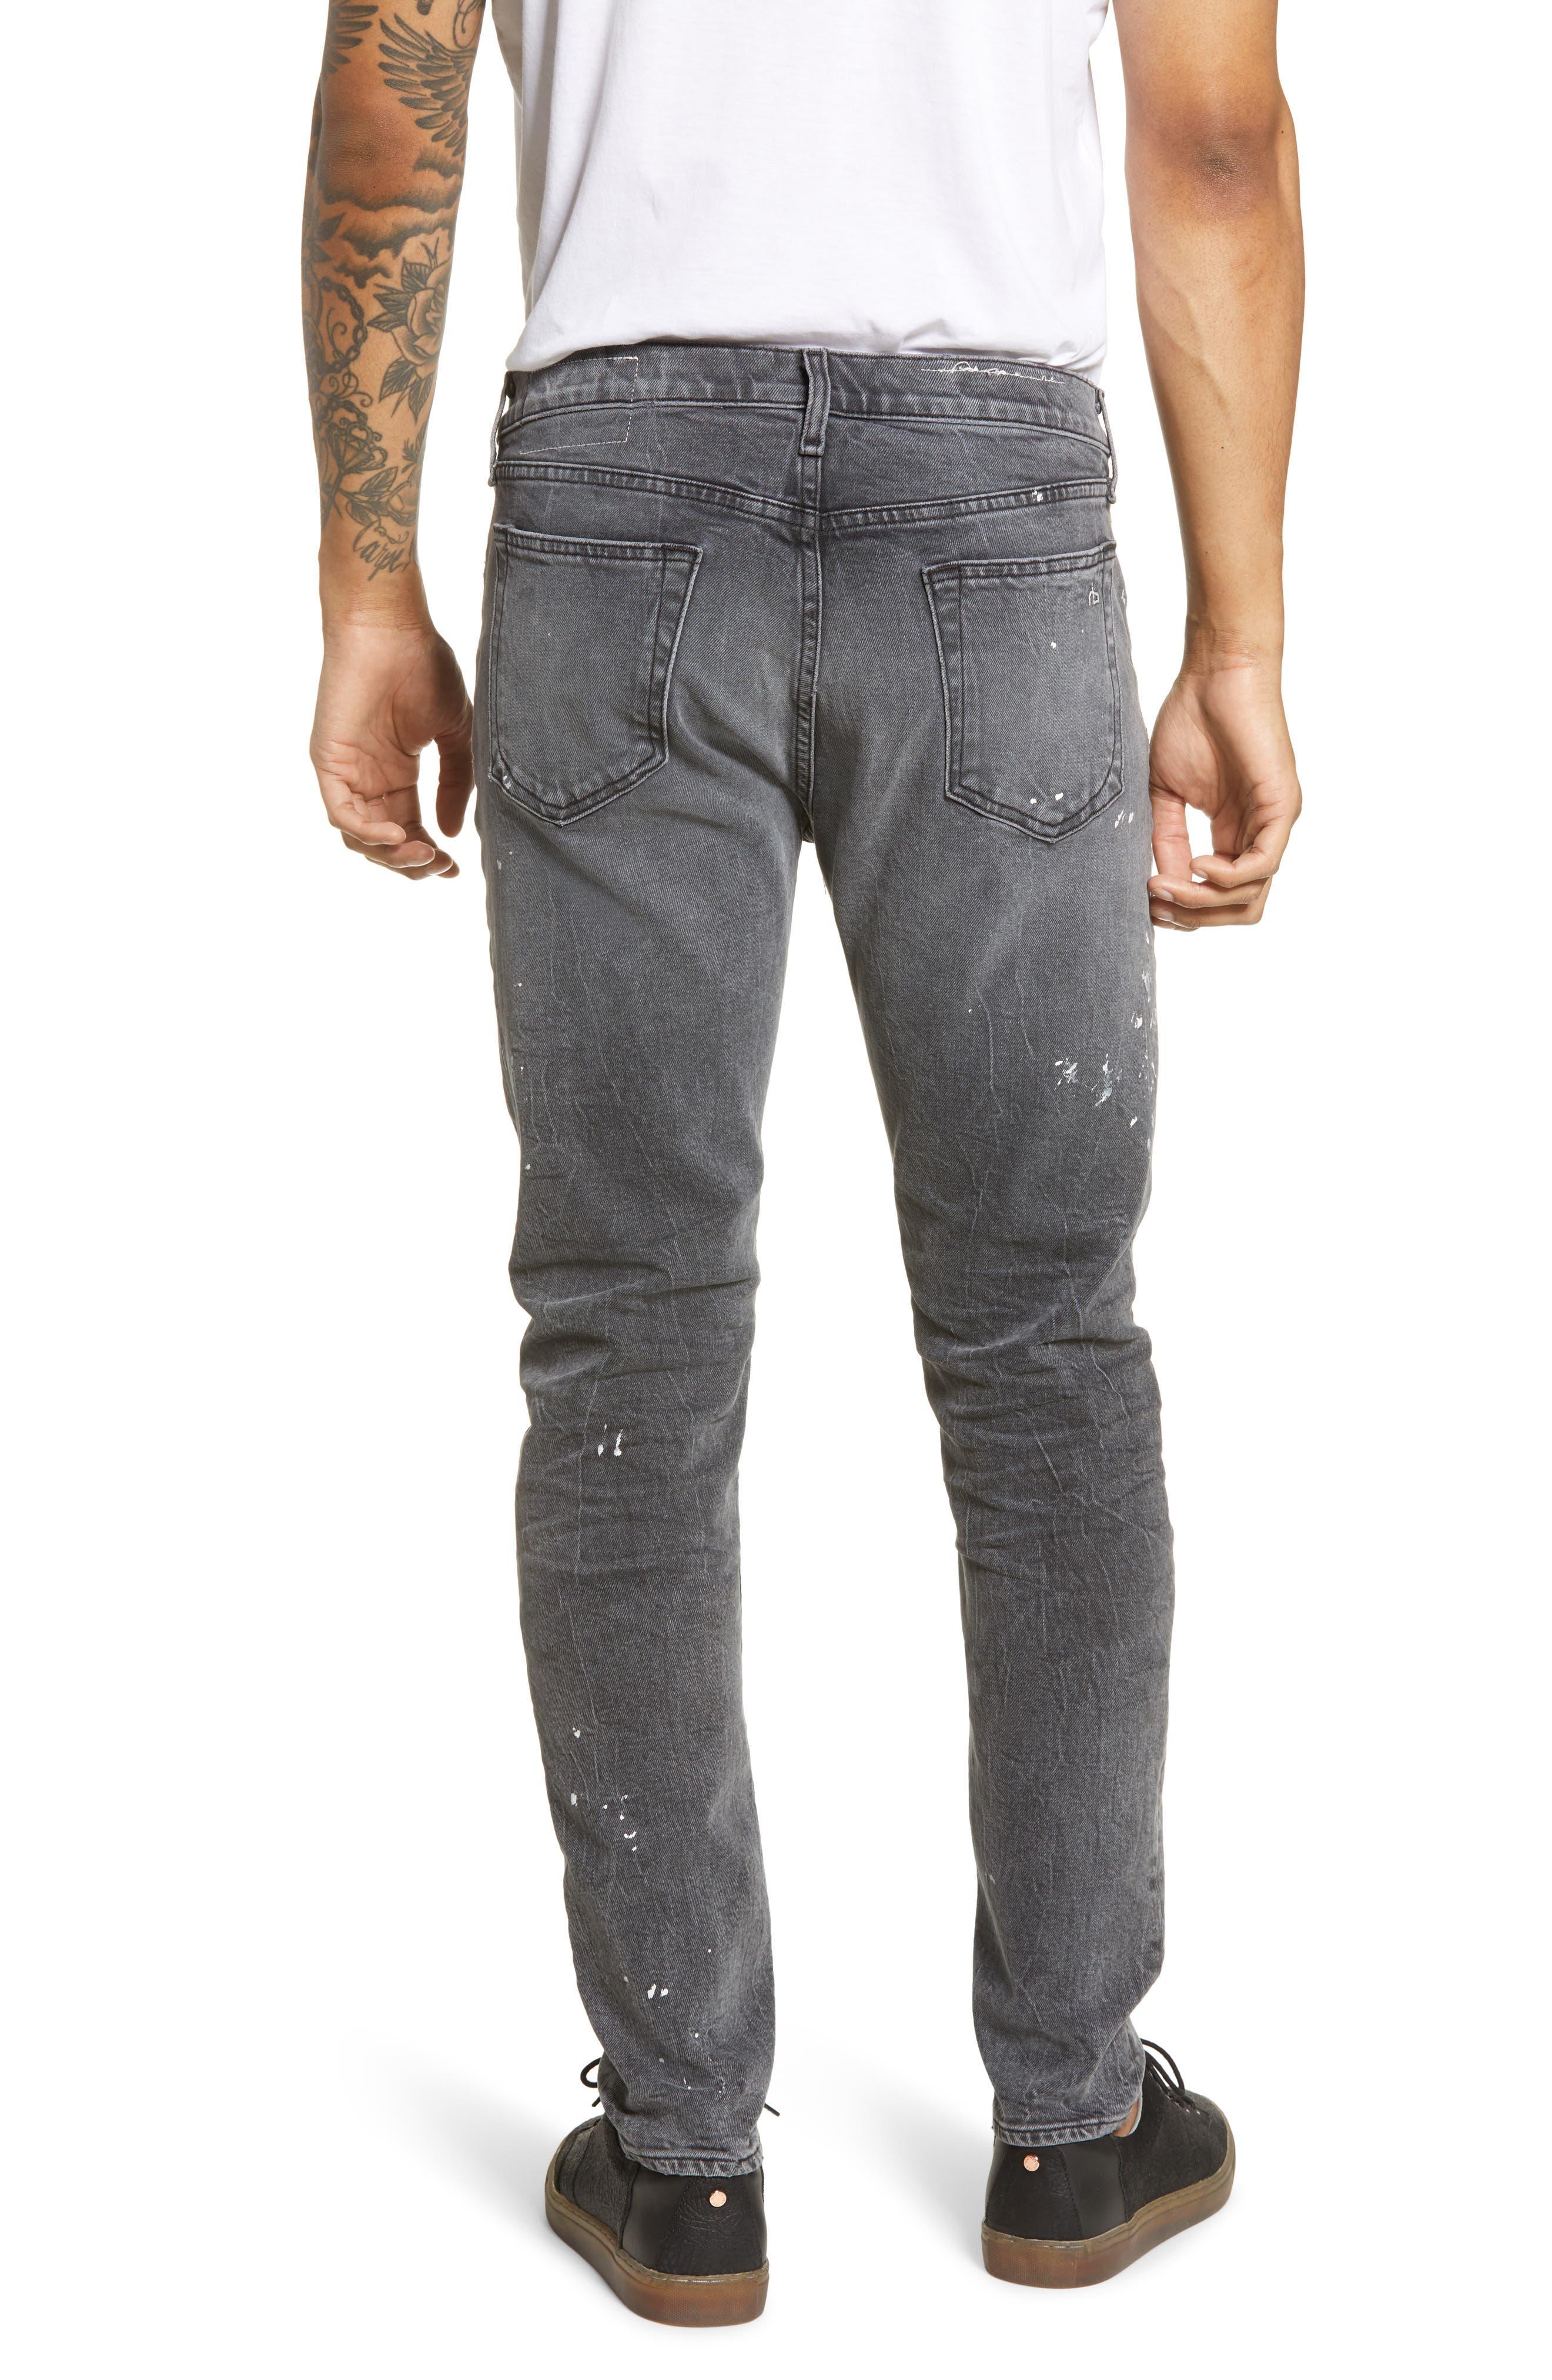 bf81c3a7 Men's Grey Wash Jeans | Nordstrom